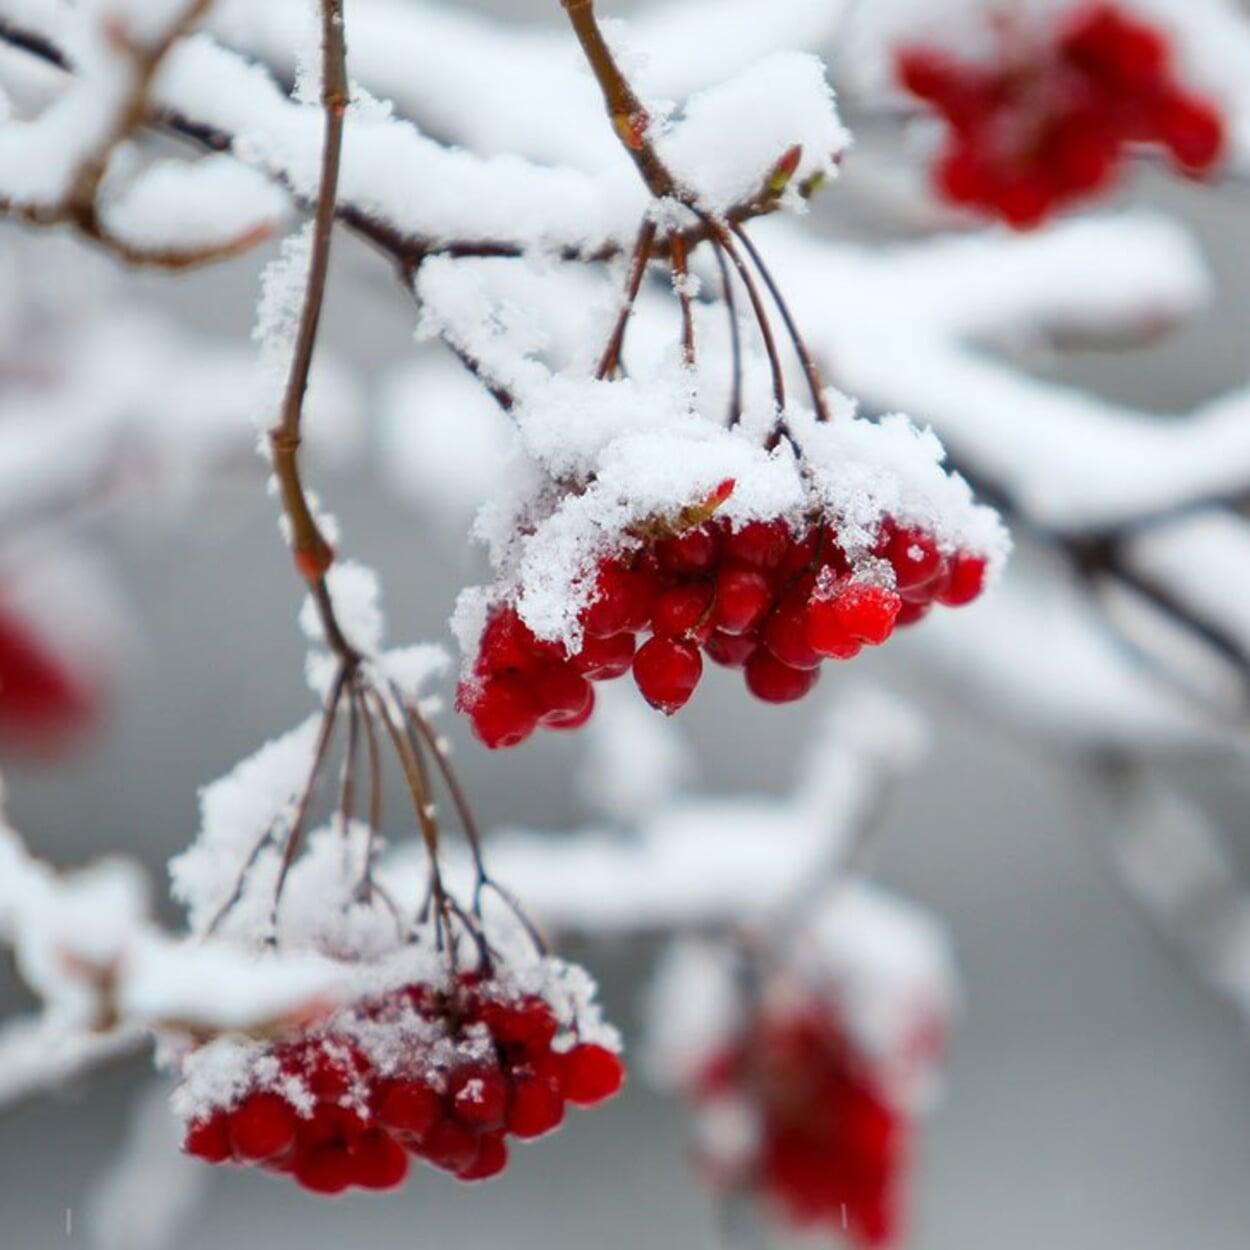 Obstgarten Januar